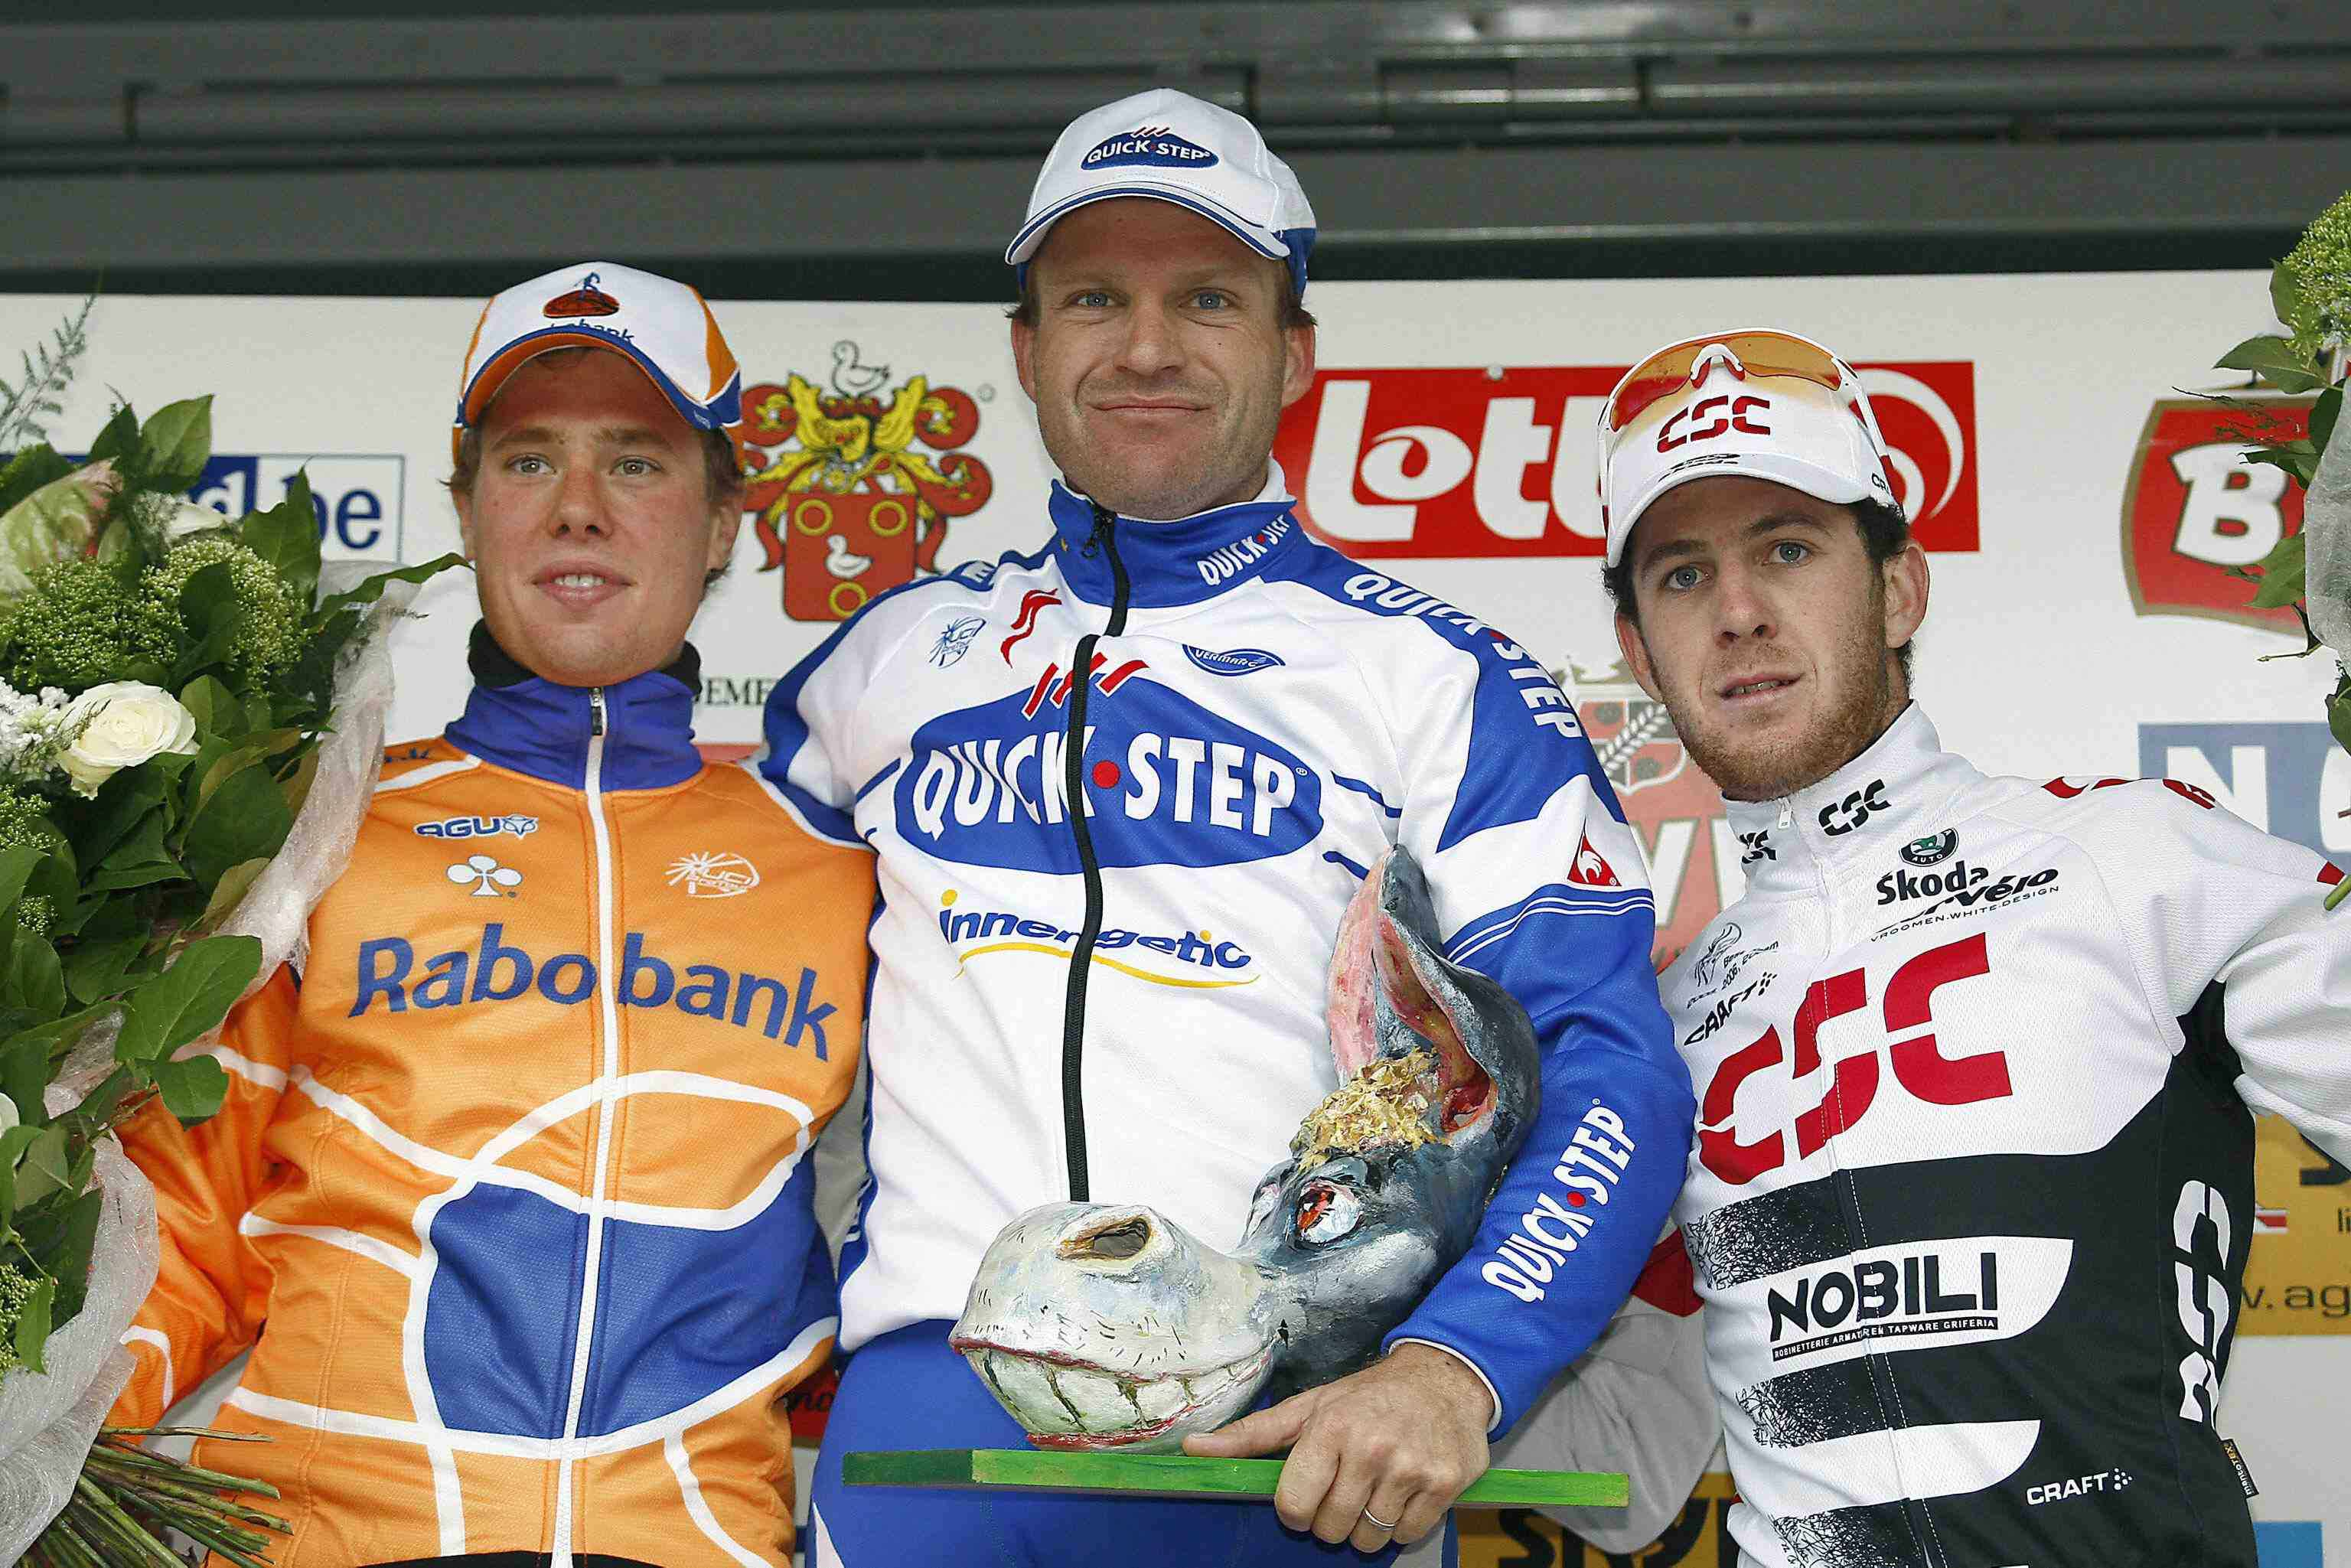 The Netherland's Sebastian Langeveld (L), Steven De Jongh (C) and Australian Matthew Goss (R) pose on the podium after the Kuurne-Brussels-Kuurne cycling race on March 2, 2008.